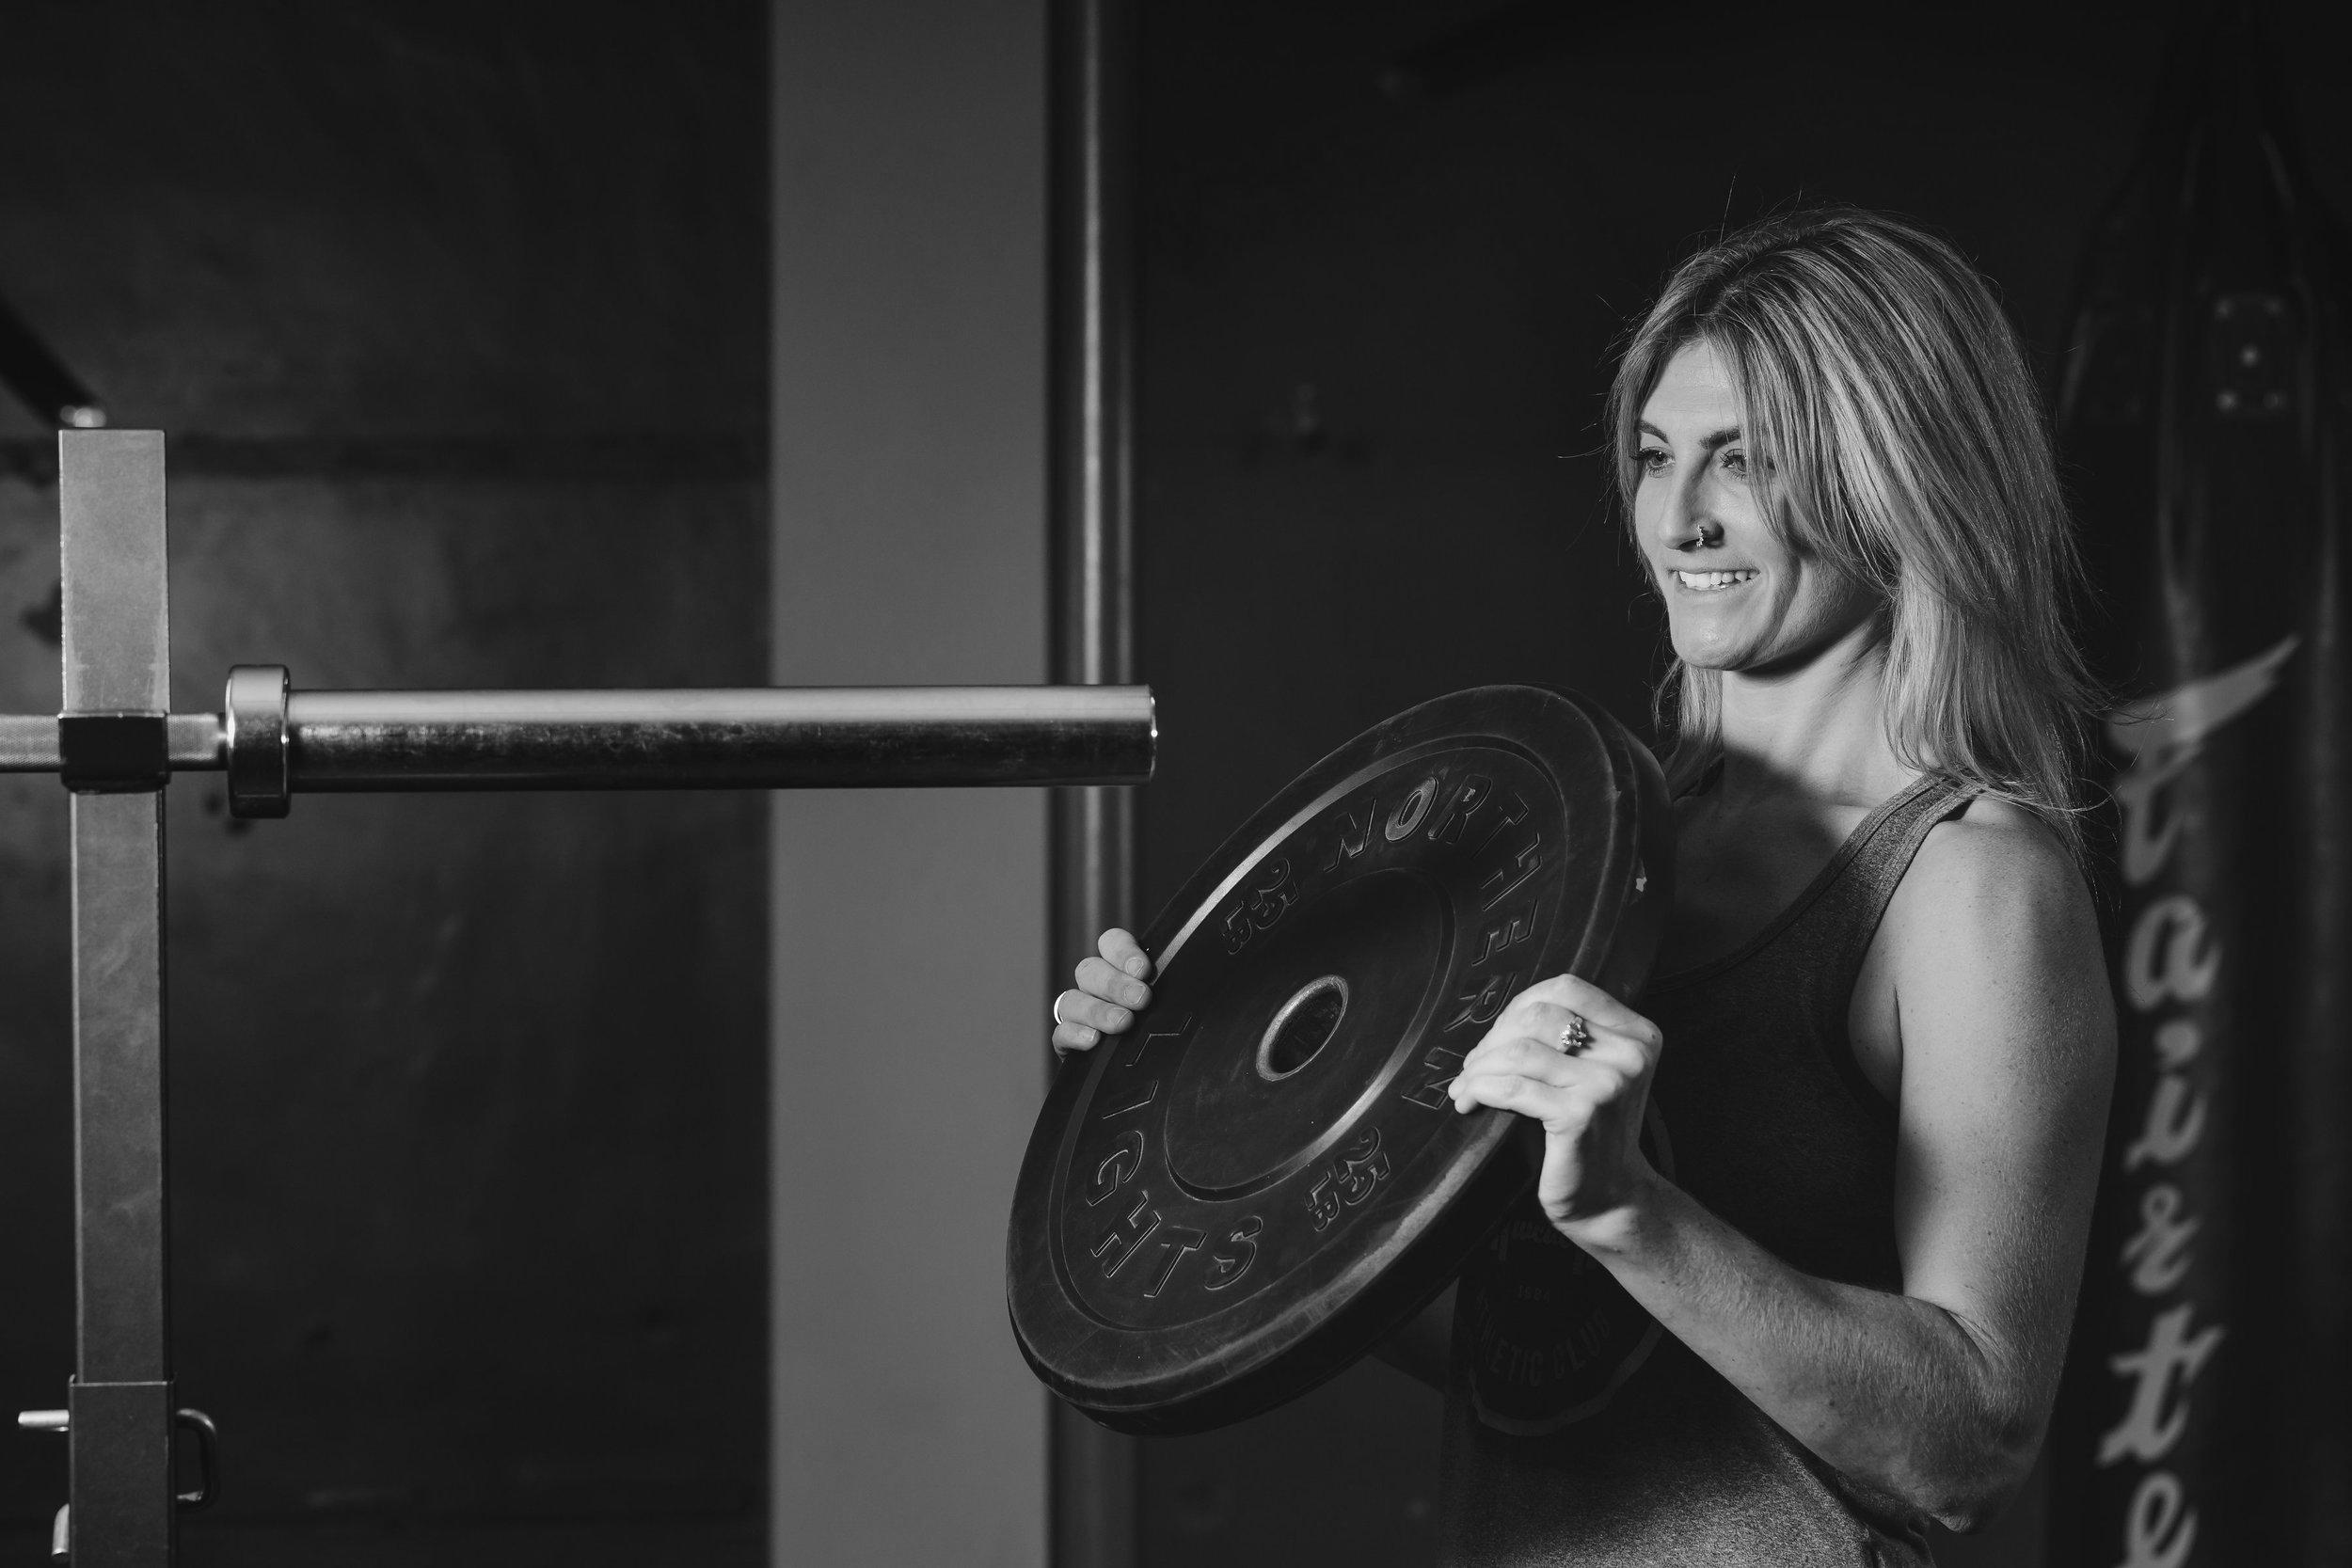 studio bumper plate weights Hannah Edleston